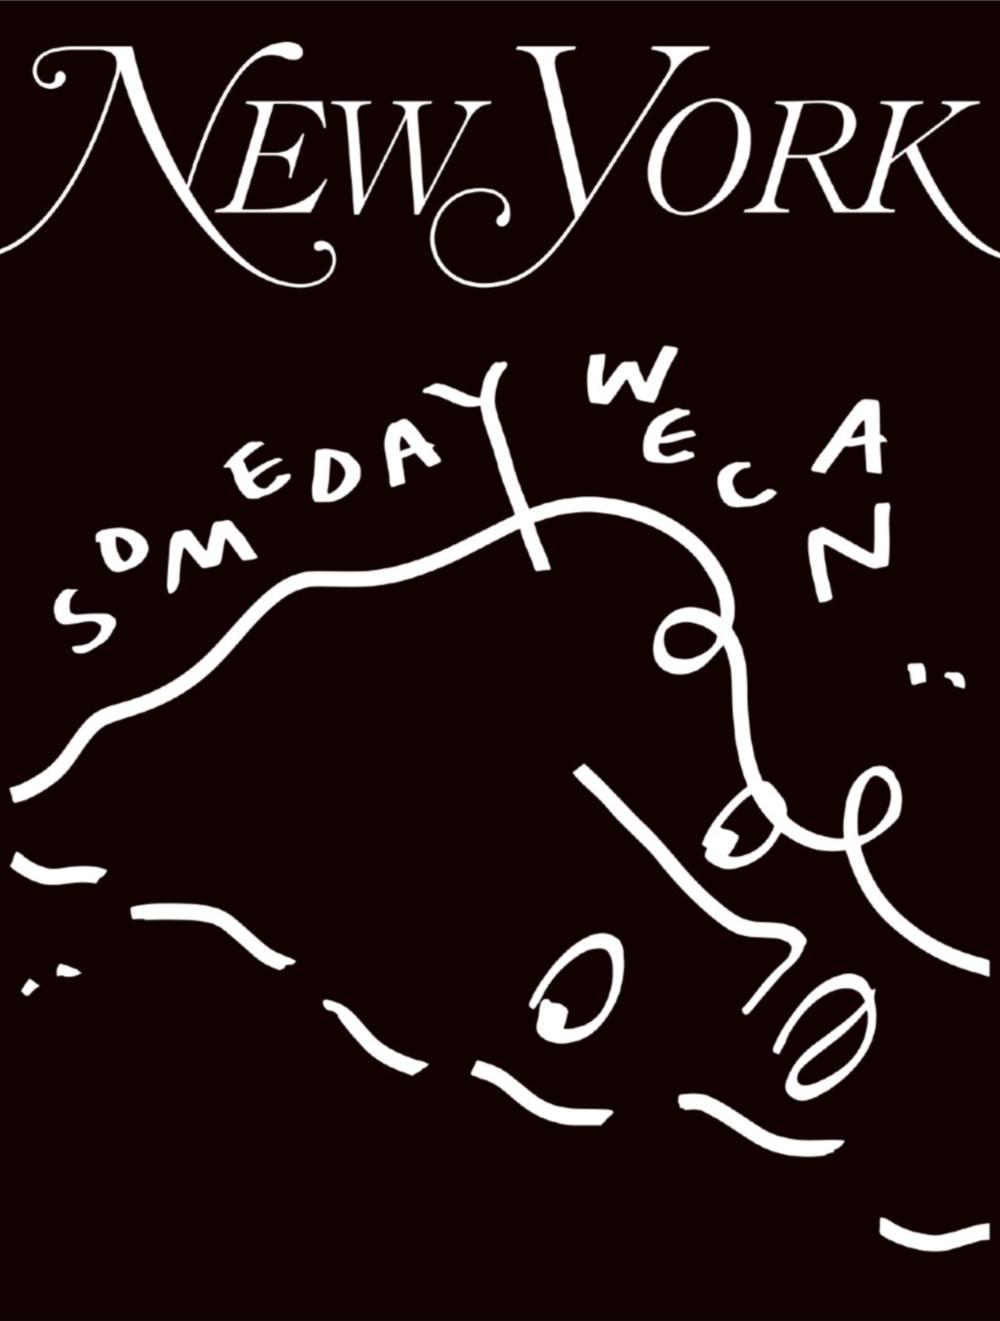 Shantell Martin